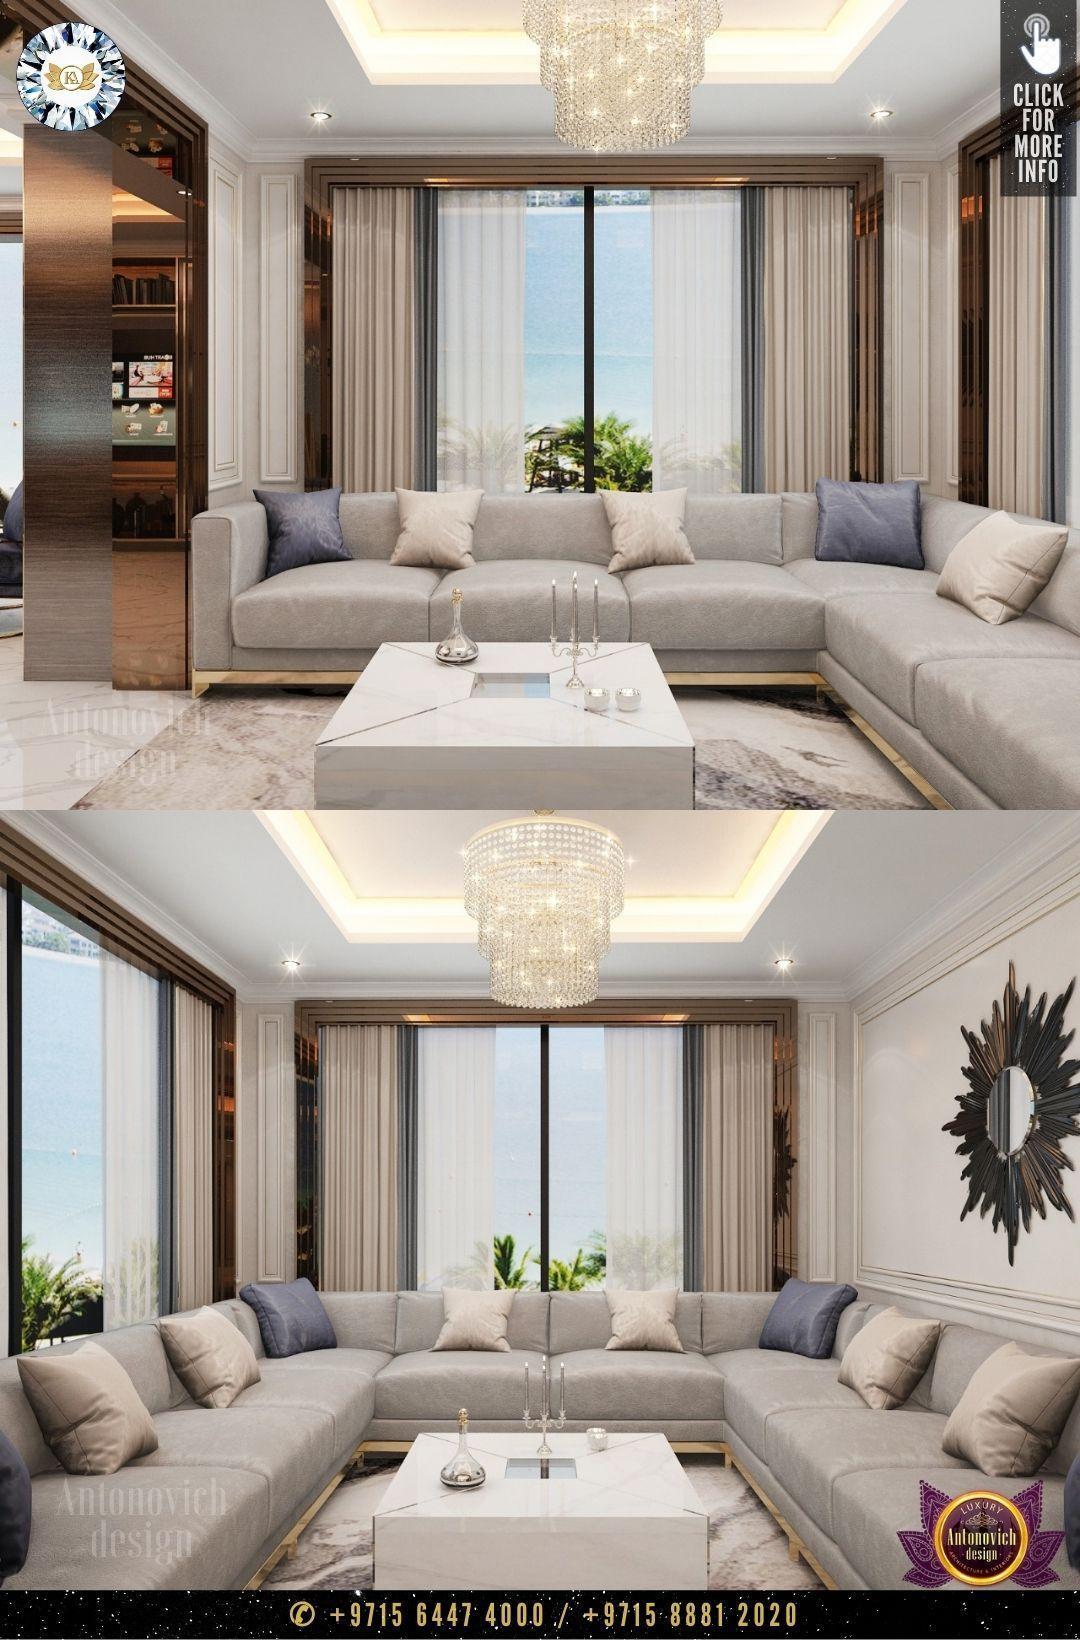 Gorgeous Villa Design Best Interior Designs For Villa أفضل التصميمات الداخلية للفيلا In 2021 Luxury Living Room Luxury Interior Luxury Villa Design Living room ideas villa